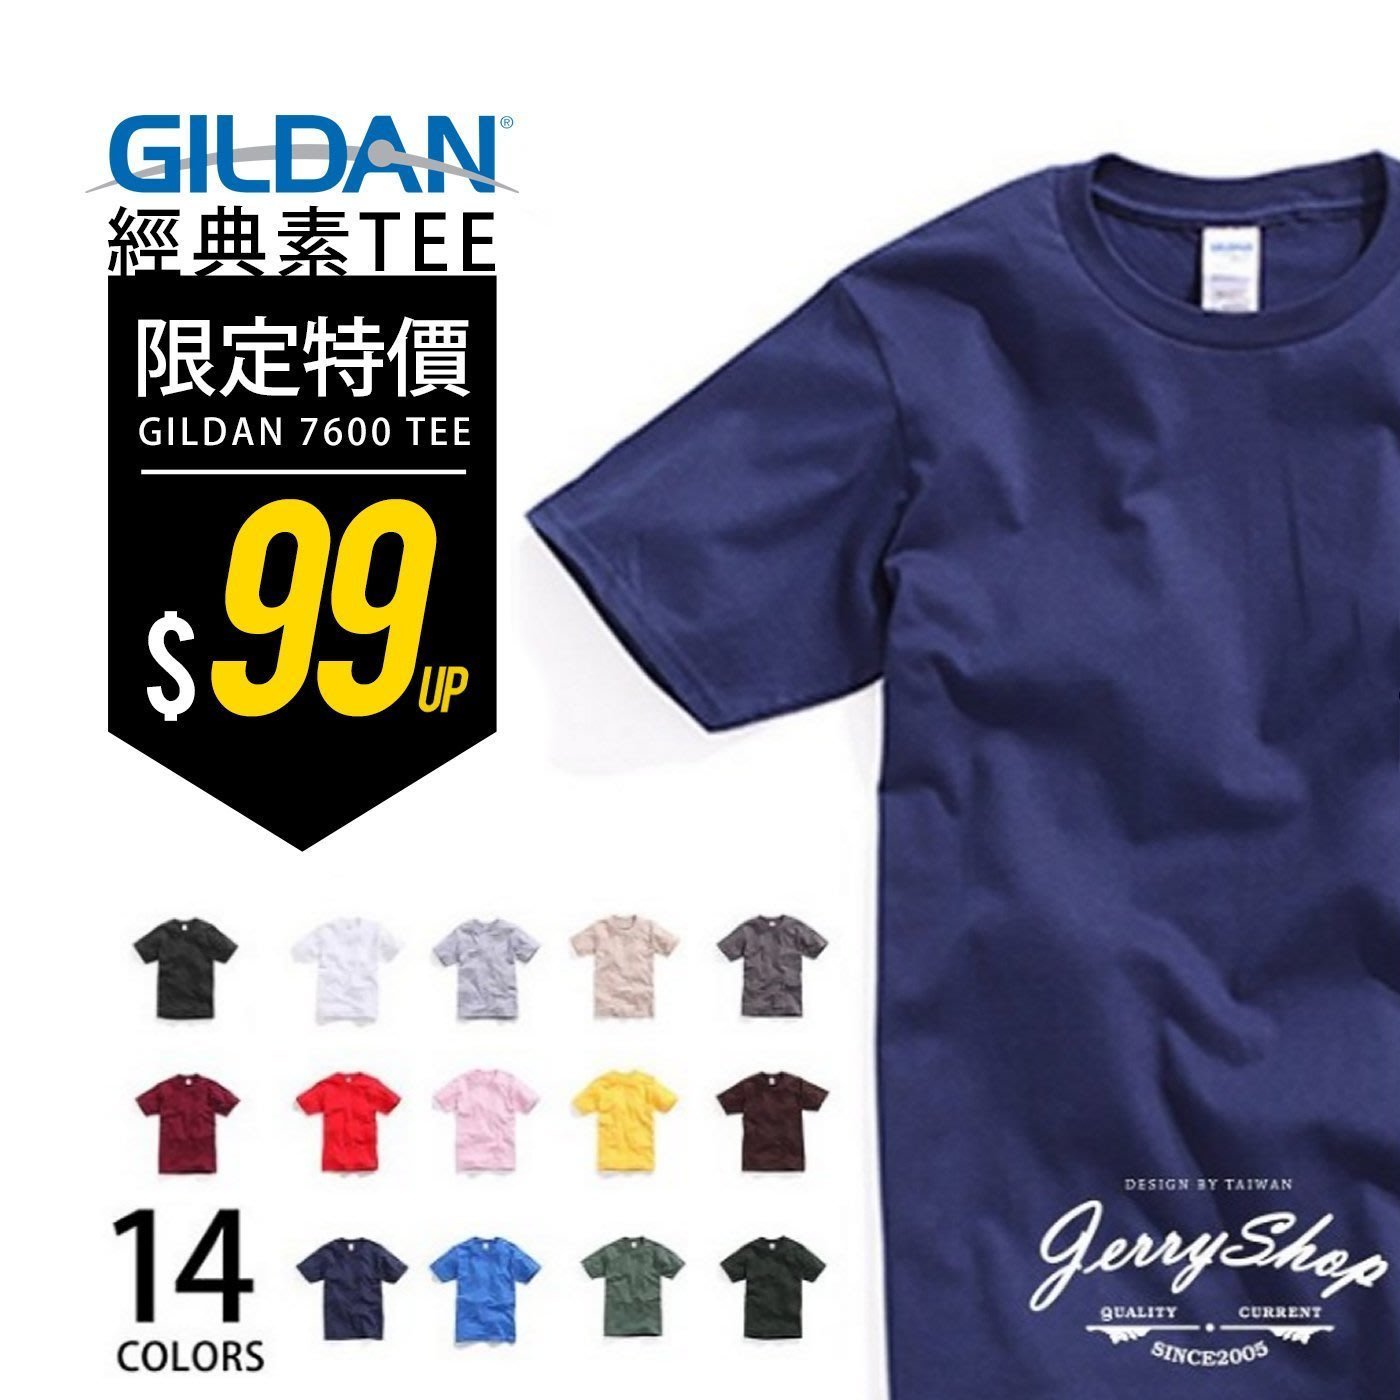 JerryShop【GGD0001】GILDAN 76000素面圓筒T 短TEE 美國棉 素T 團購 (多色)XS~XL